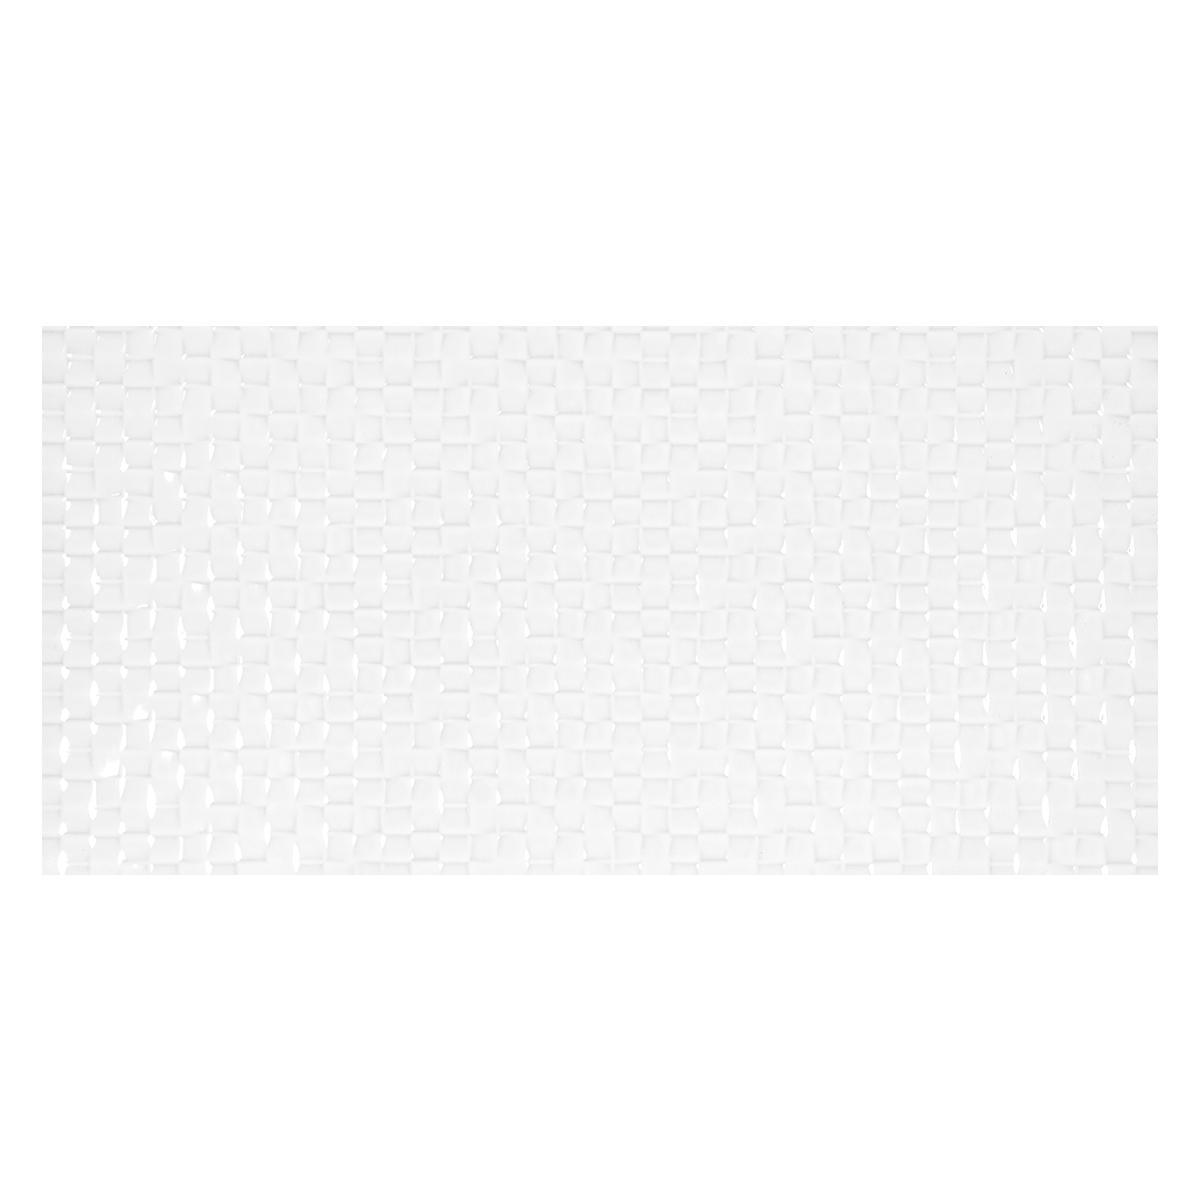 Mayólica Snow Blanco Brillante - 30X60 cm - 1.62 m2